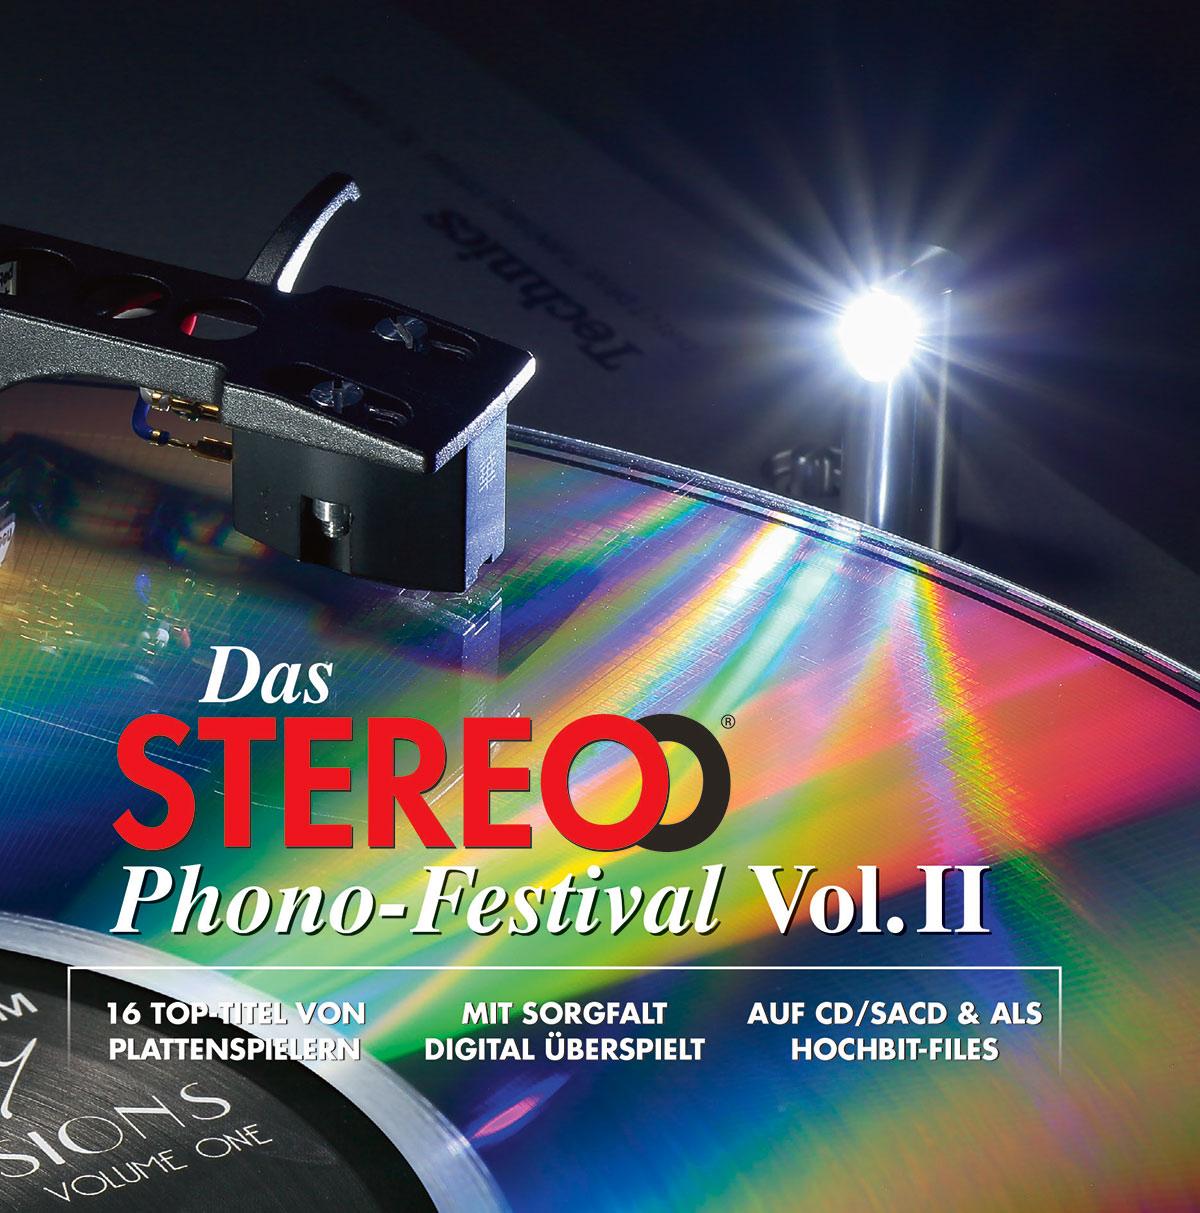 Das Stereo Phono-Festival Vol  2 - Various - Album :: in-akustik